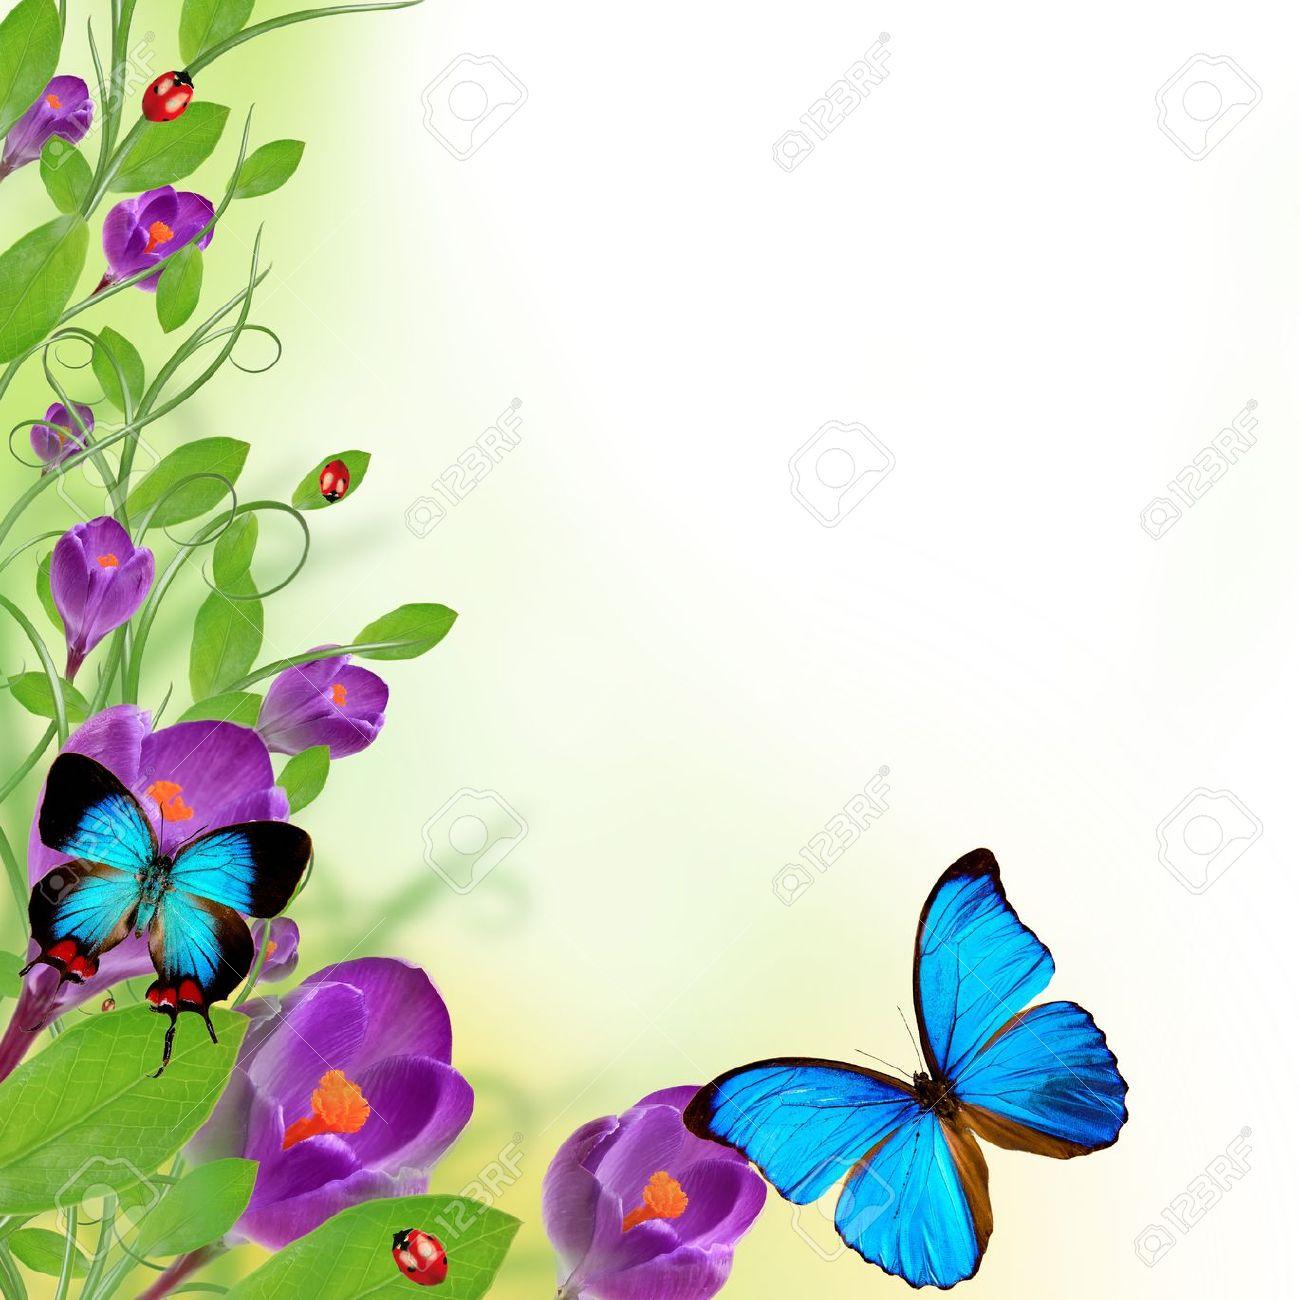 Beautiful floral design stock photo picture and royalty free image beautiful floral design stock photo 14763736 izmirmasajfo